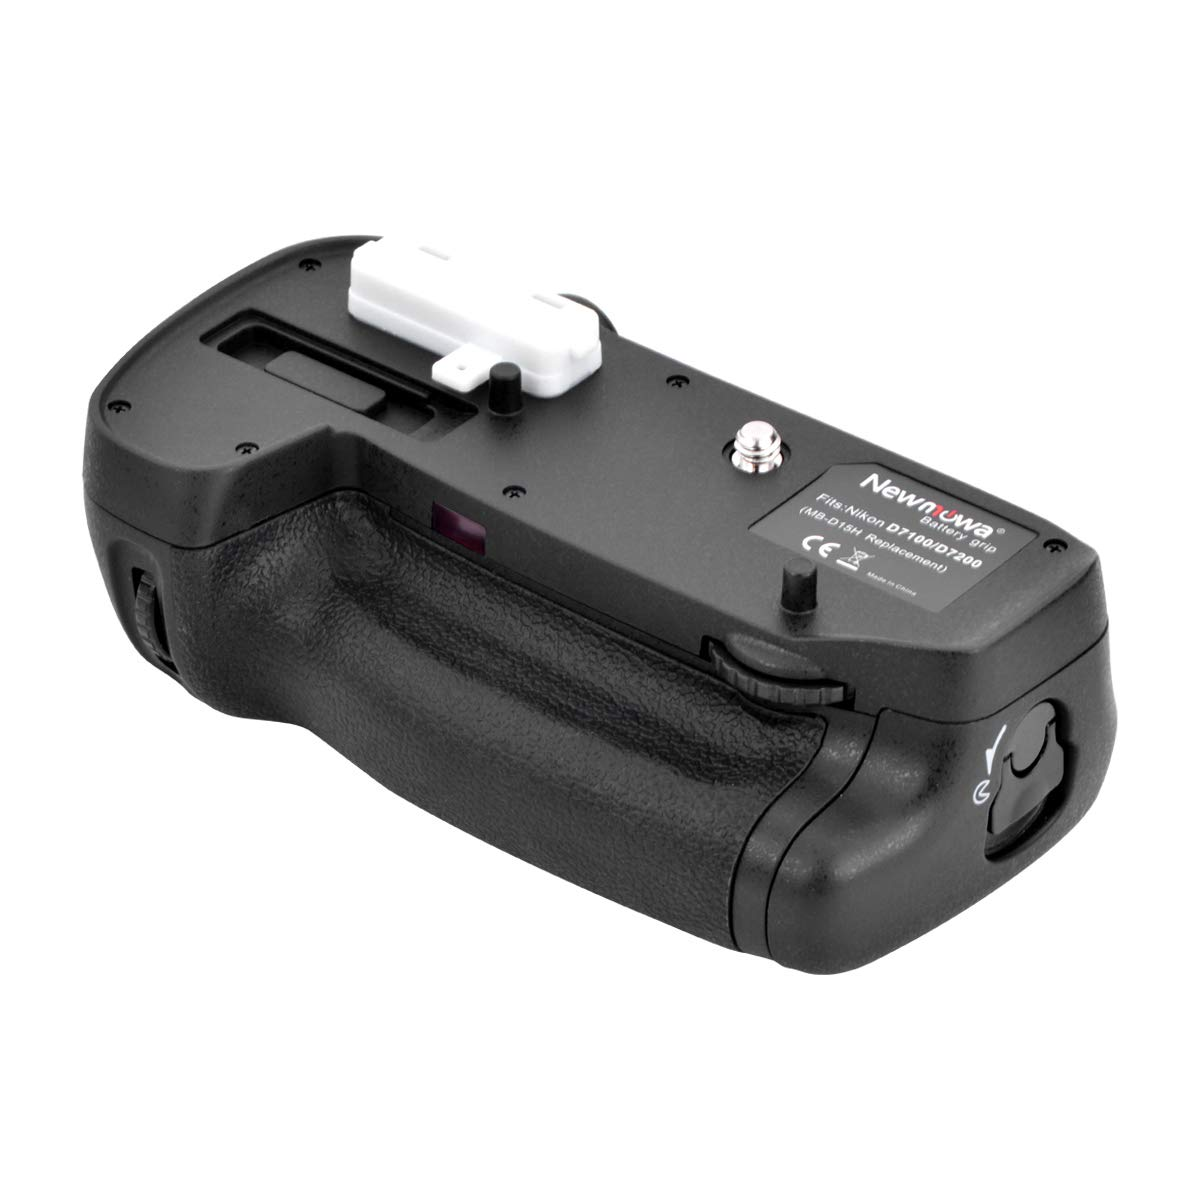 Newmowa MB-D15H Mango de Repuesto Battery Grip para Nikon D7100 ...